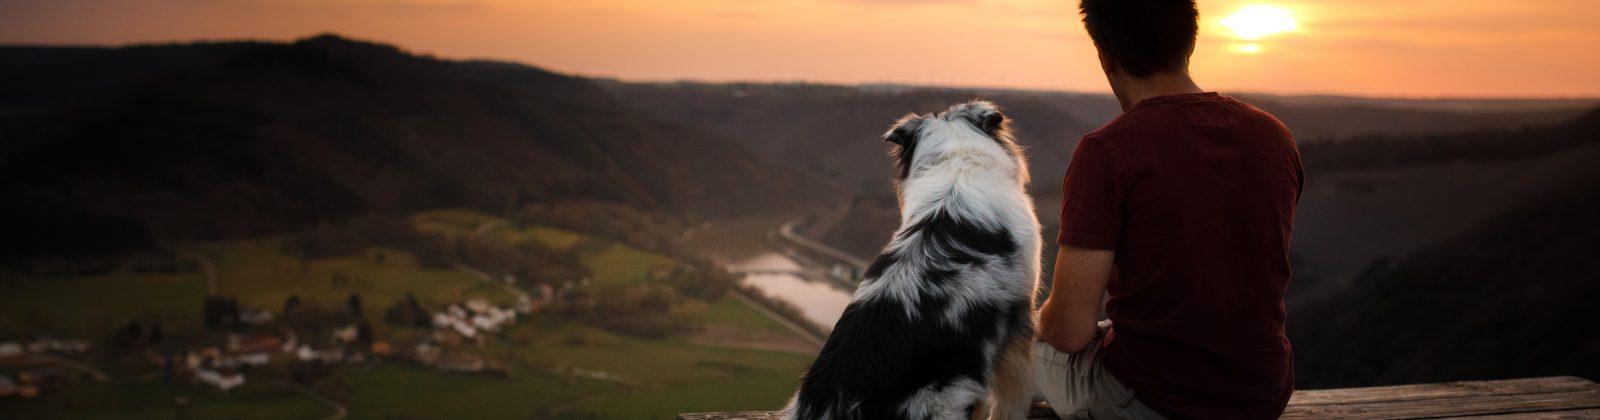 man with dog sunset